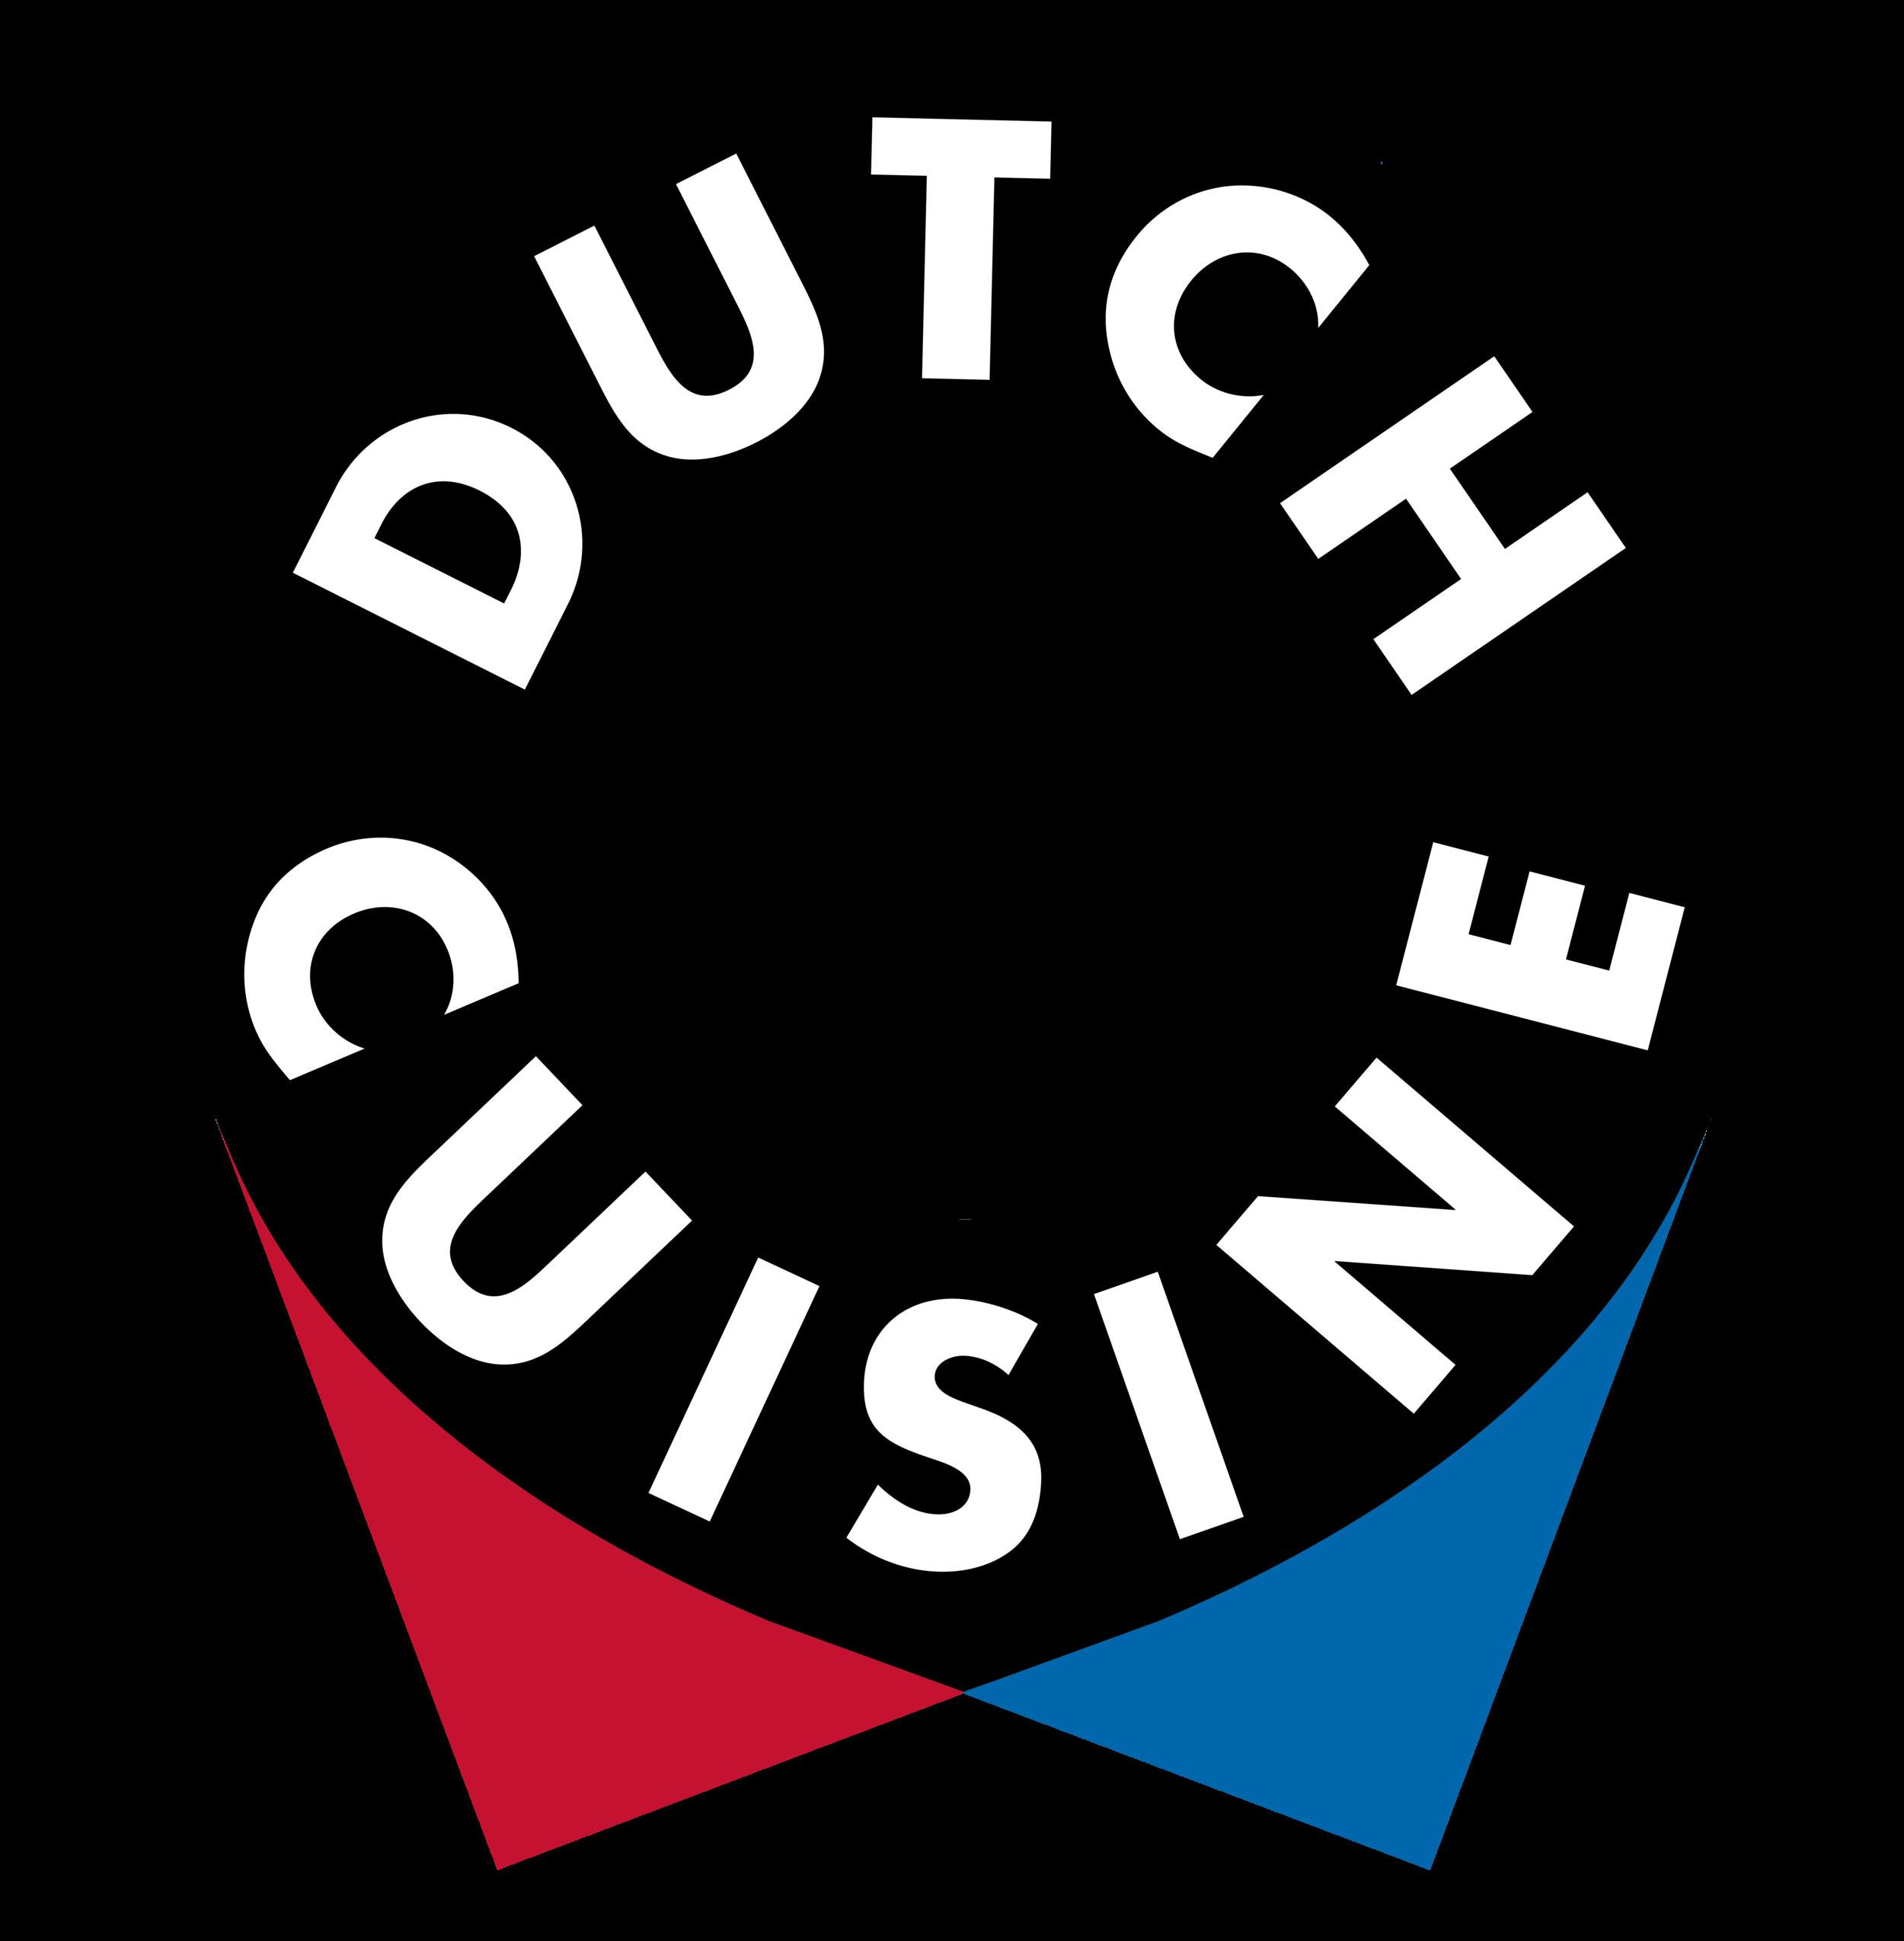 Logo_DutchCuisine_CMYK_new-01.png